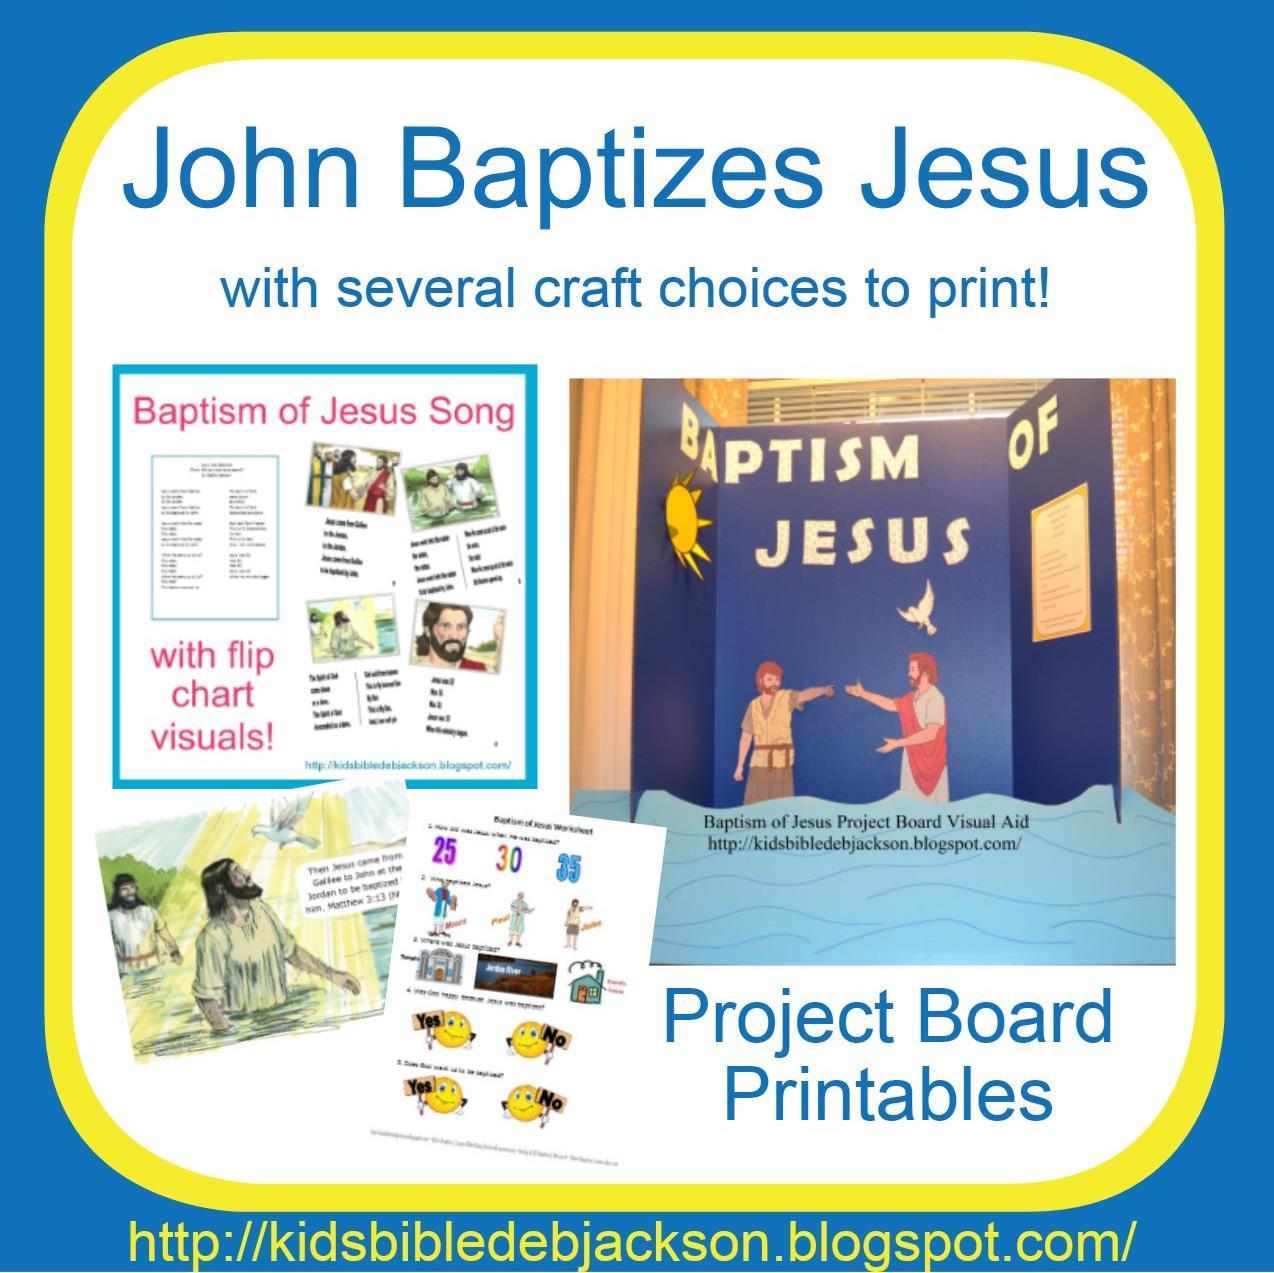 http://kidsbibledebjackson.blogspot.com/2014/07/john-baptizes-jesus.html